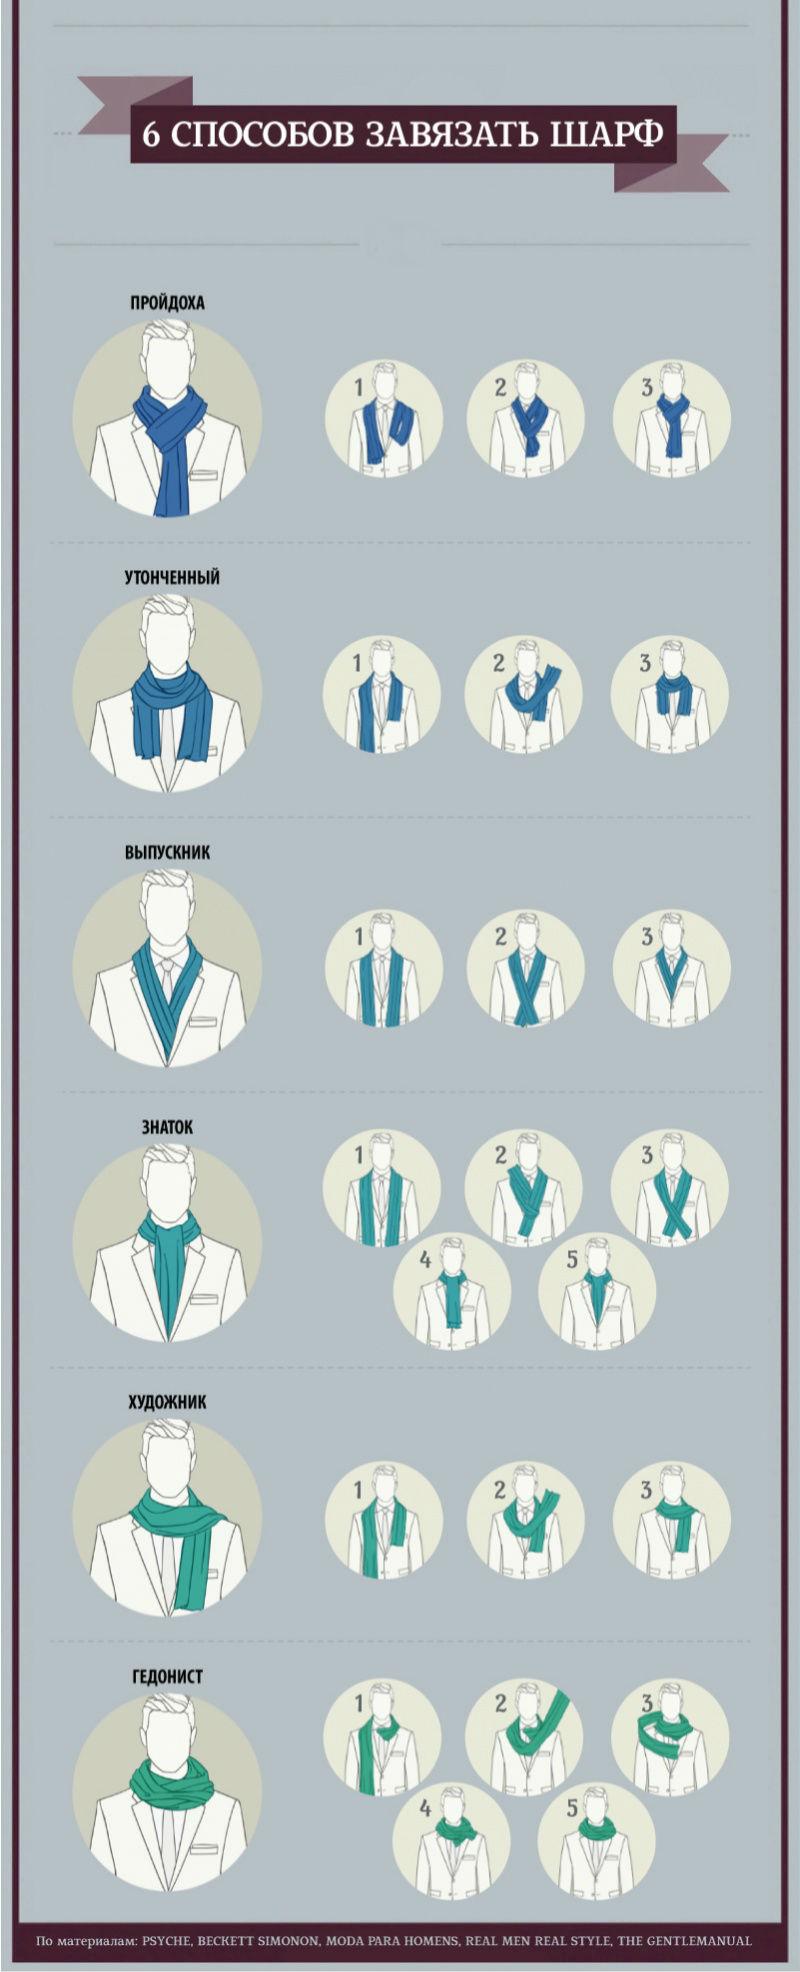 Правила стиля